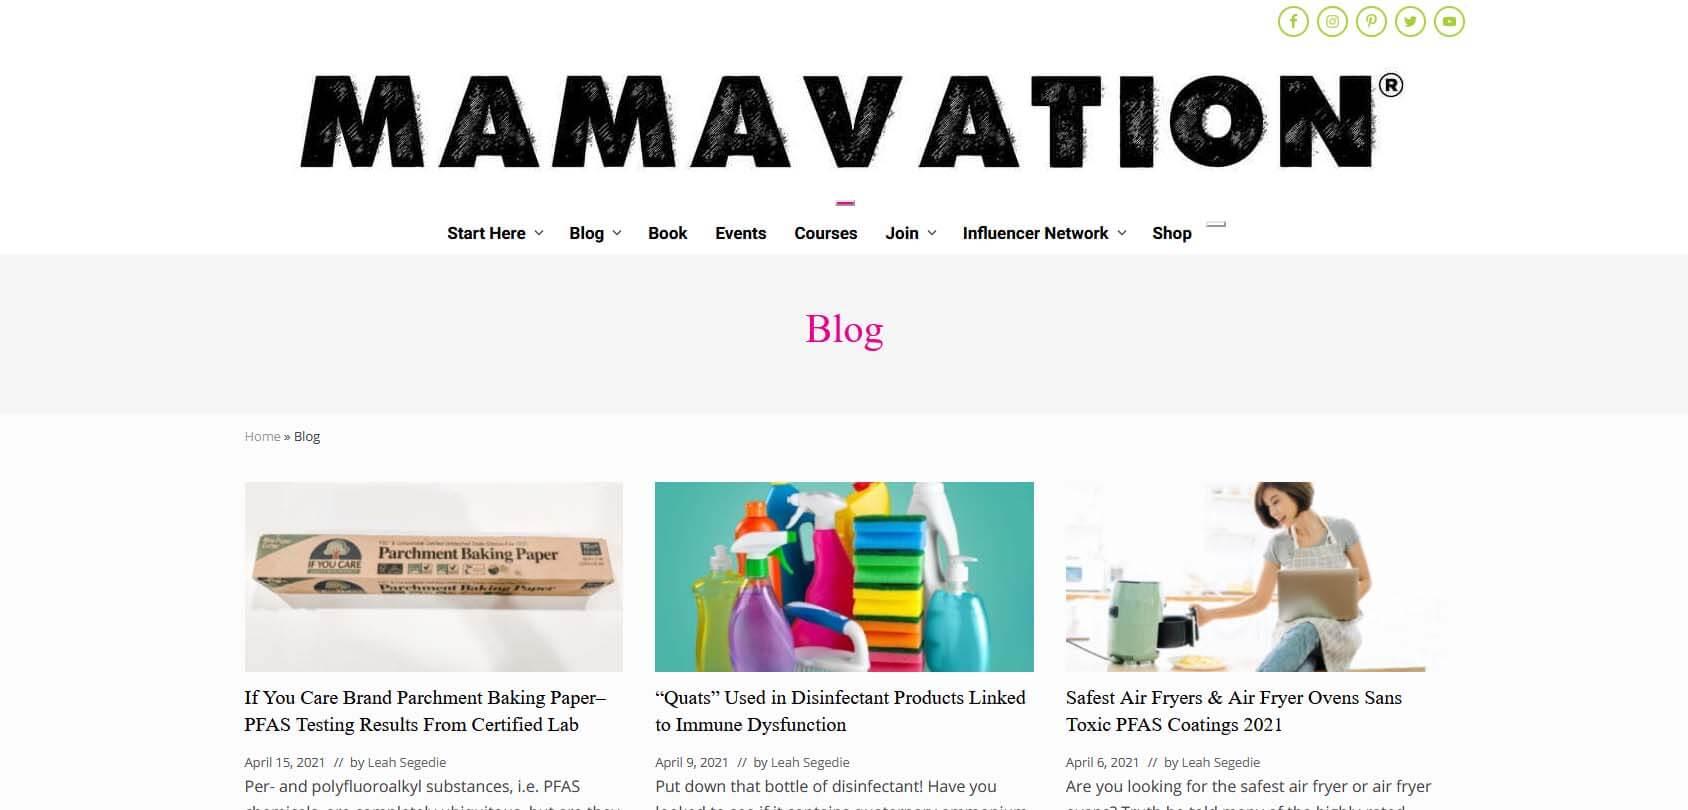 Mamavation Homepage